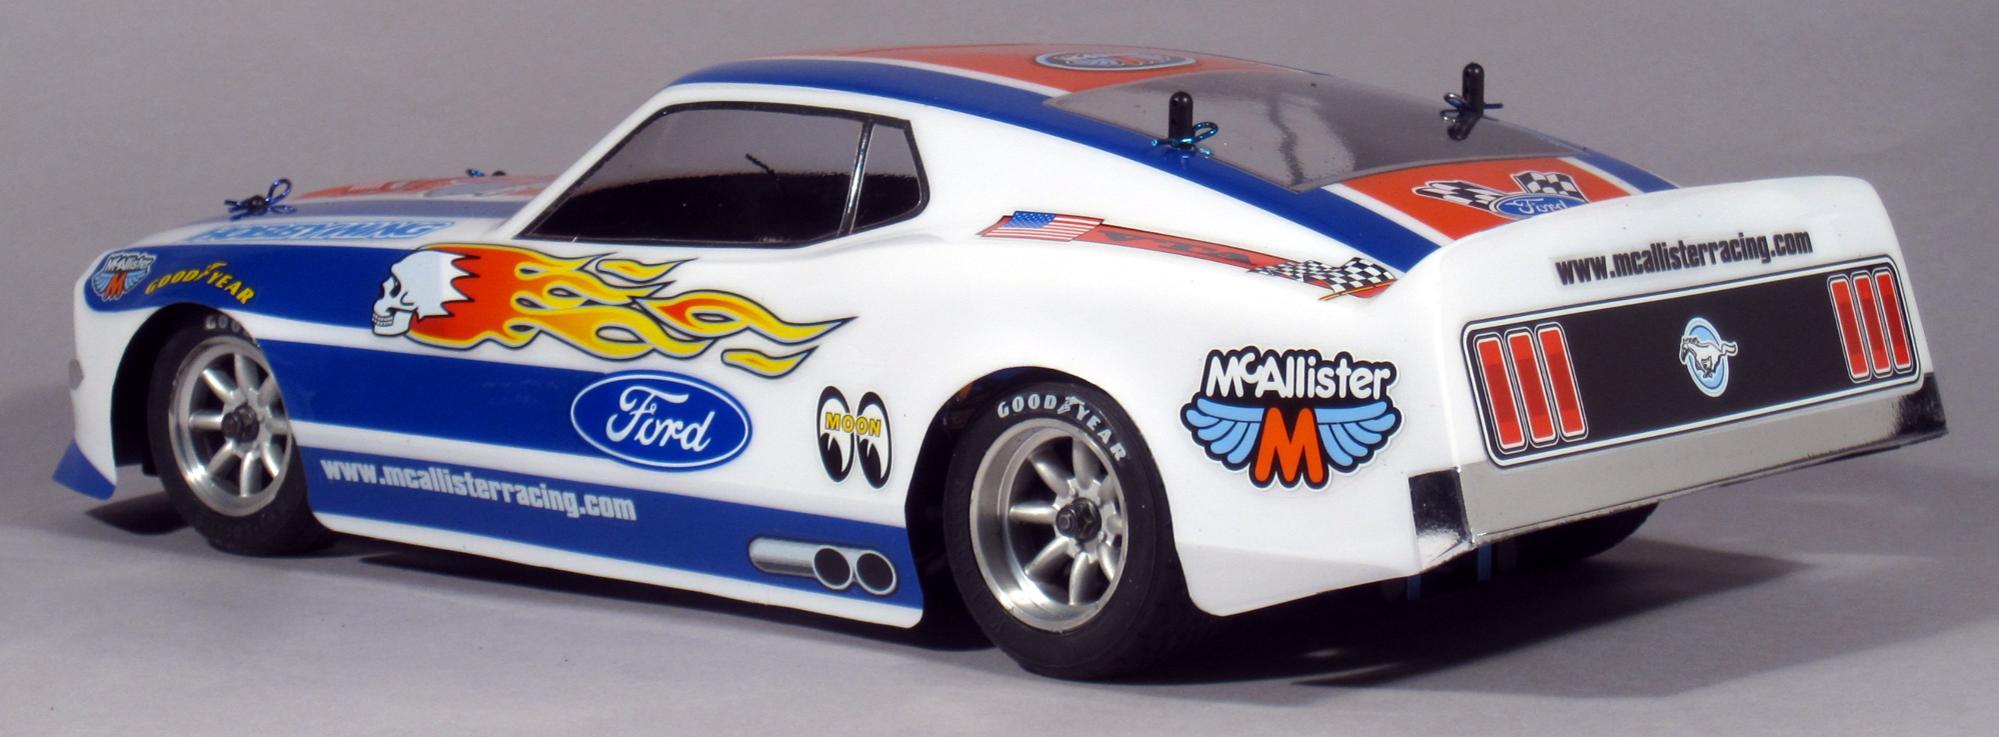 U S Vintage Trans Am Racing Part 2 286 202 69 Mustang